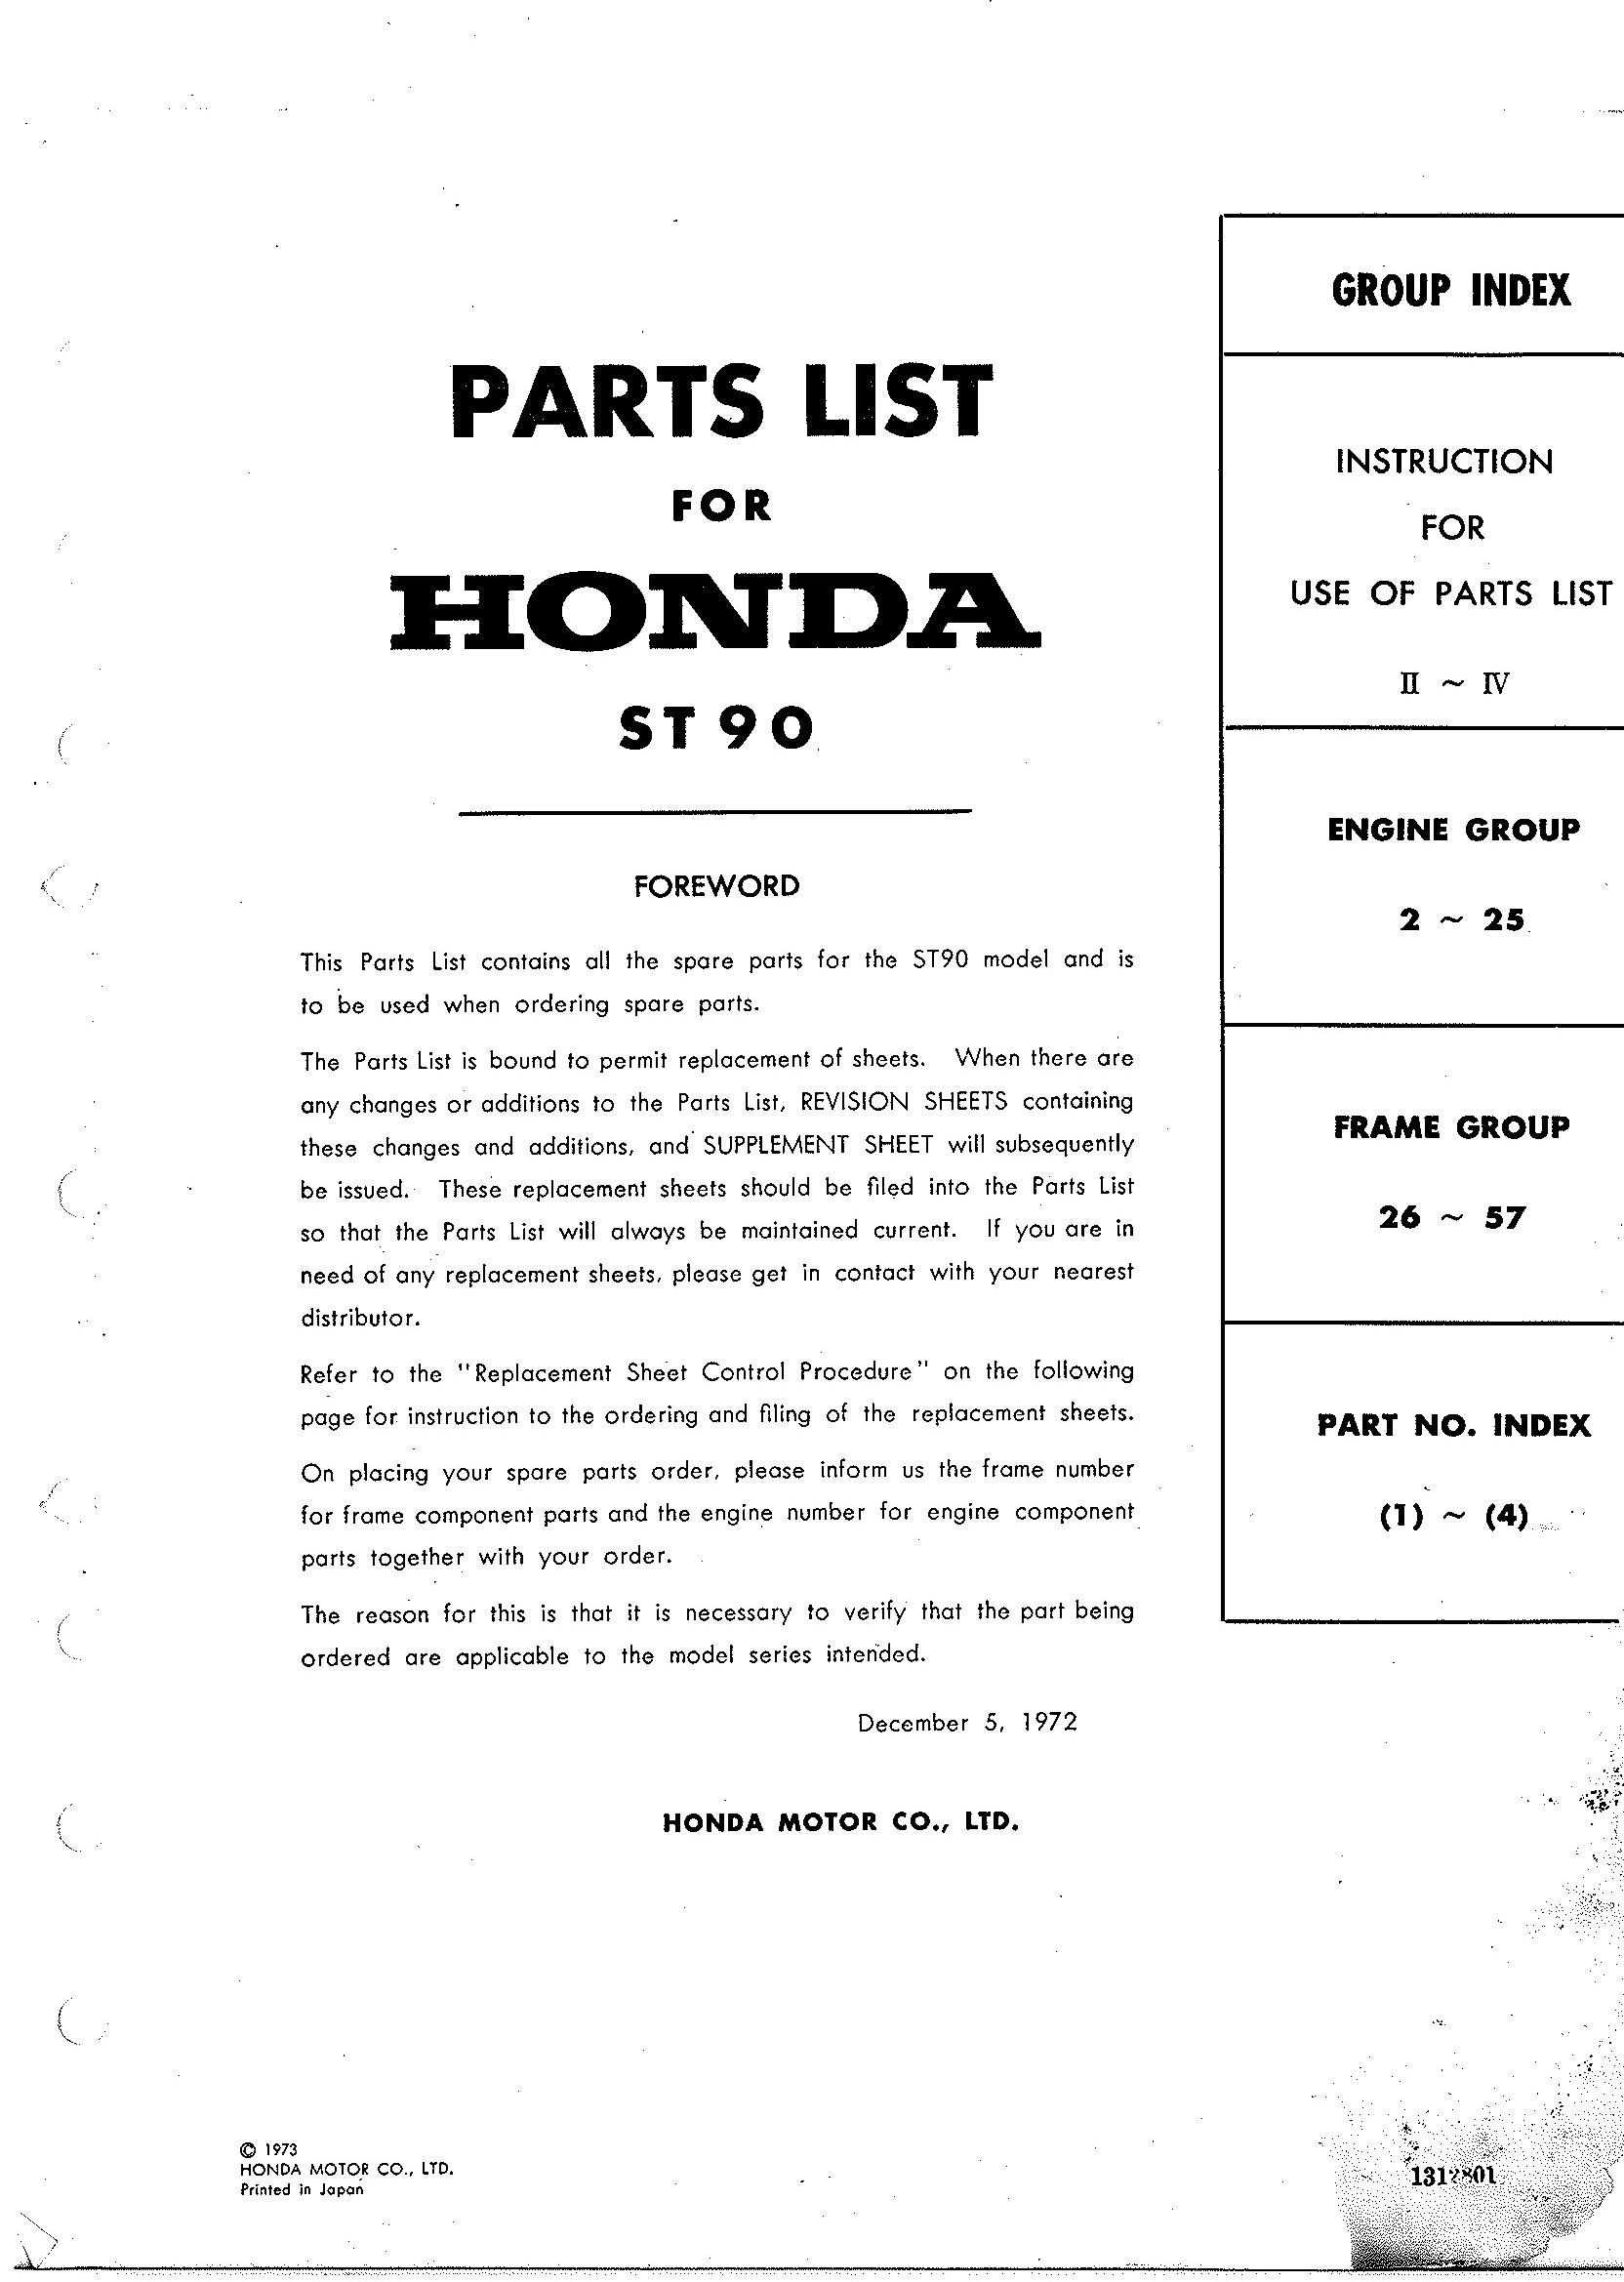 Parts List for Honda ST70G (1973)